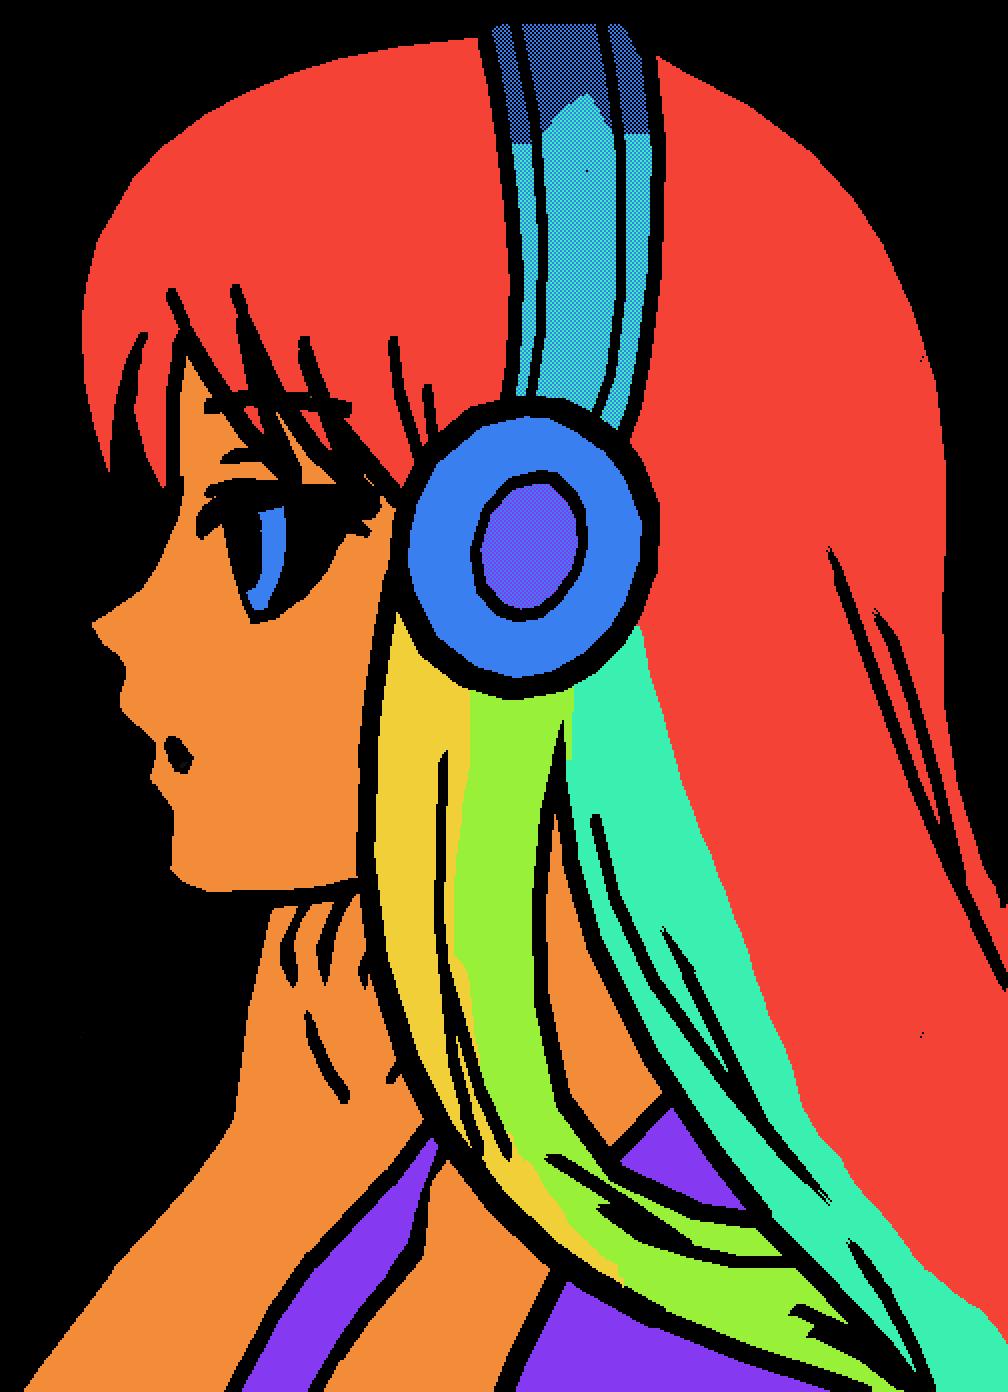 Rainbow Woman by JilltehNerd